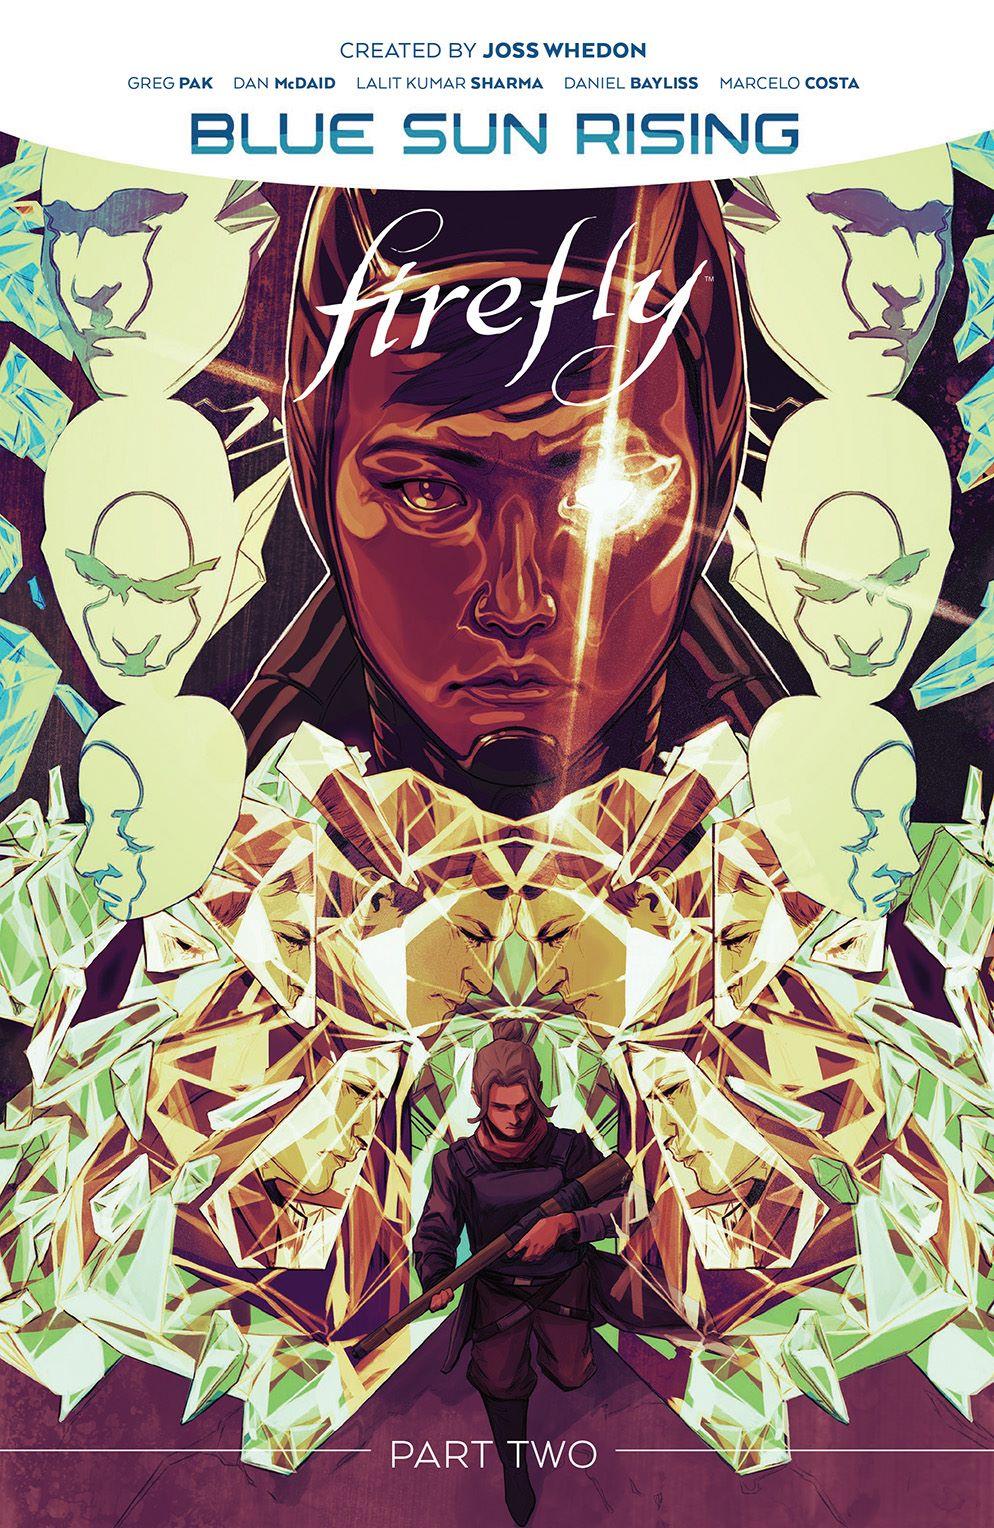 Firefly_BlueSunRising_v2_HC_Cover ComicList Previews: FIREFLY BLUE SUN RISING VOLUME 2 HC